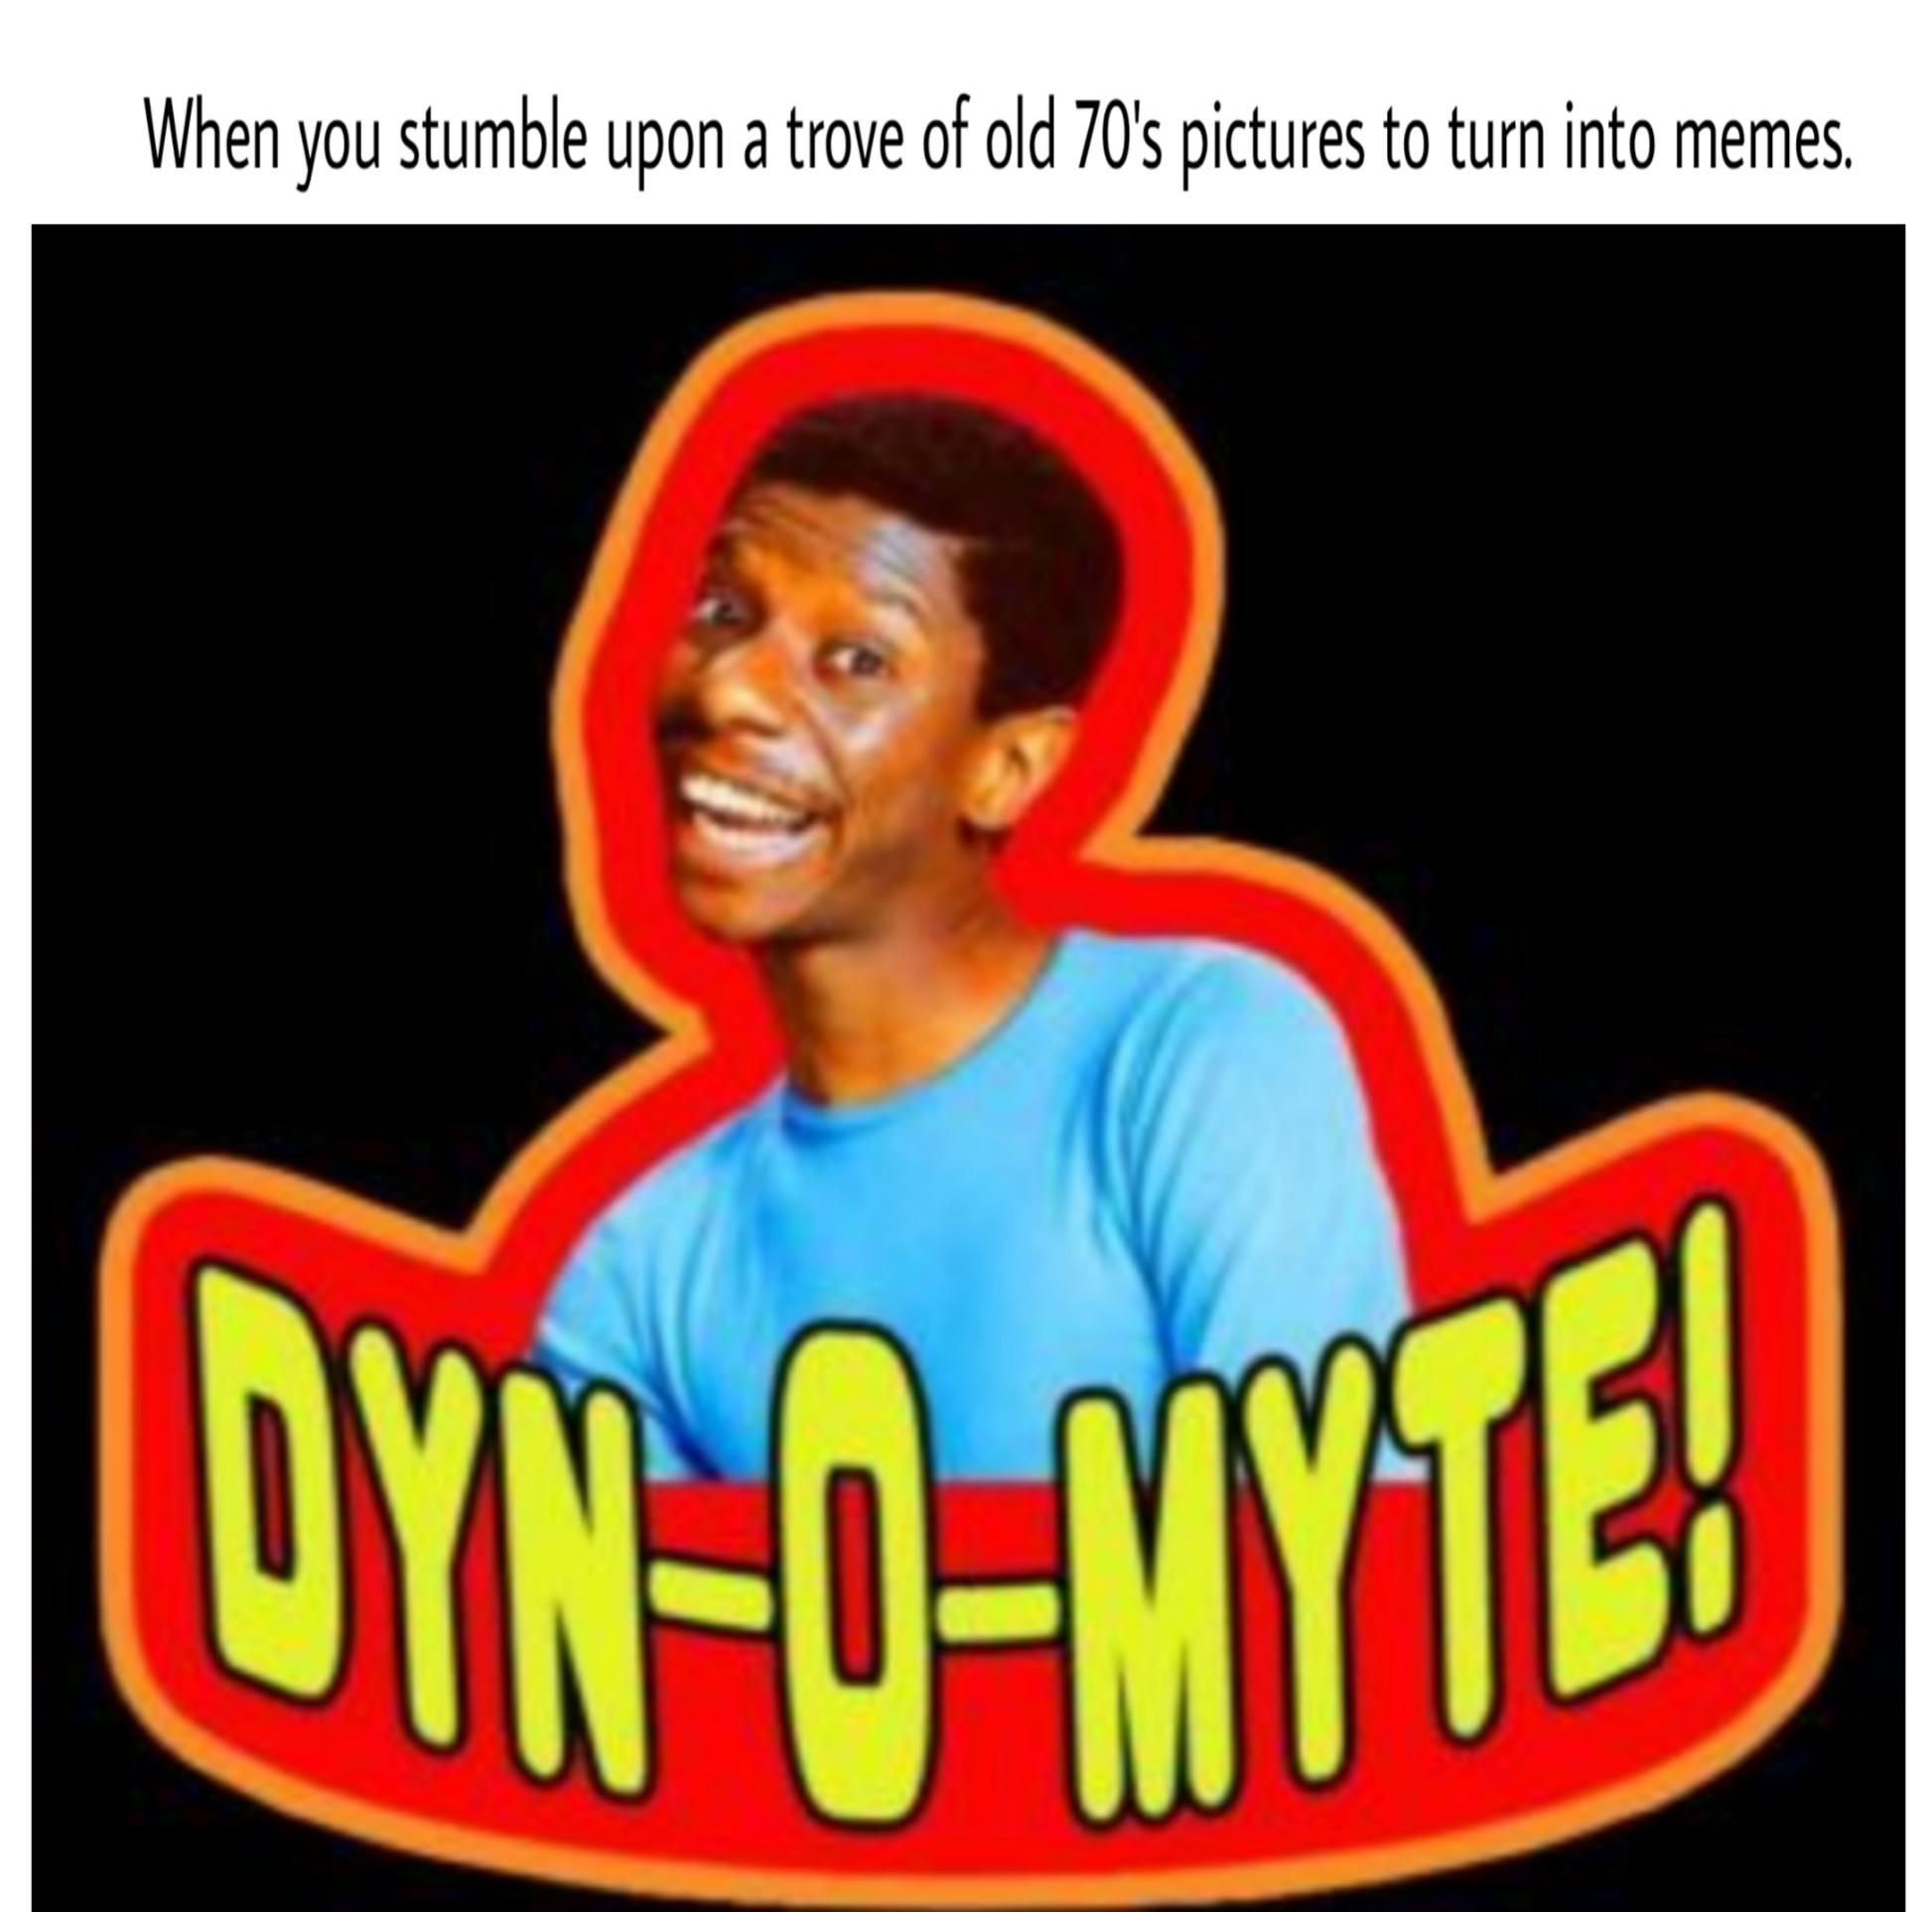 Dynomyte - meme